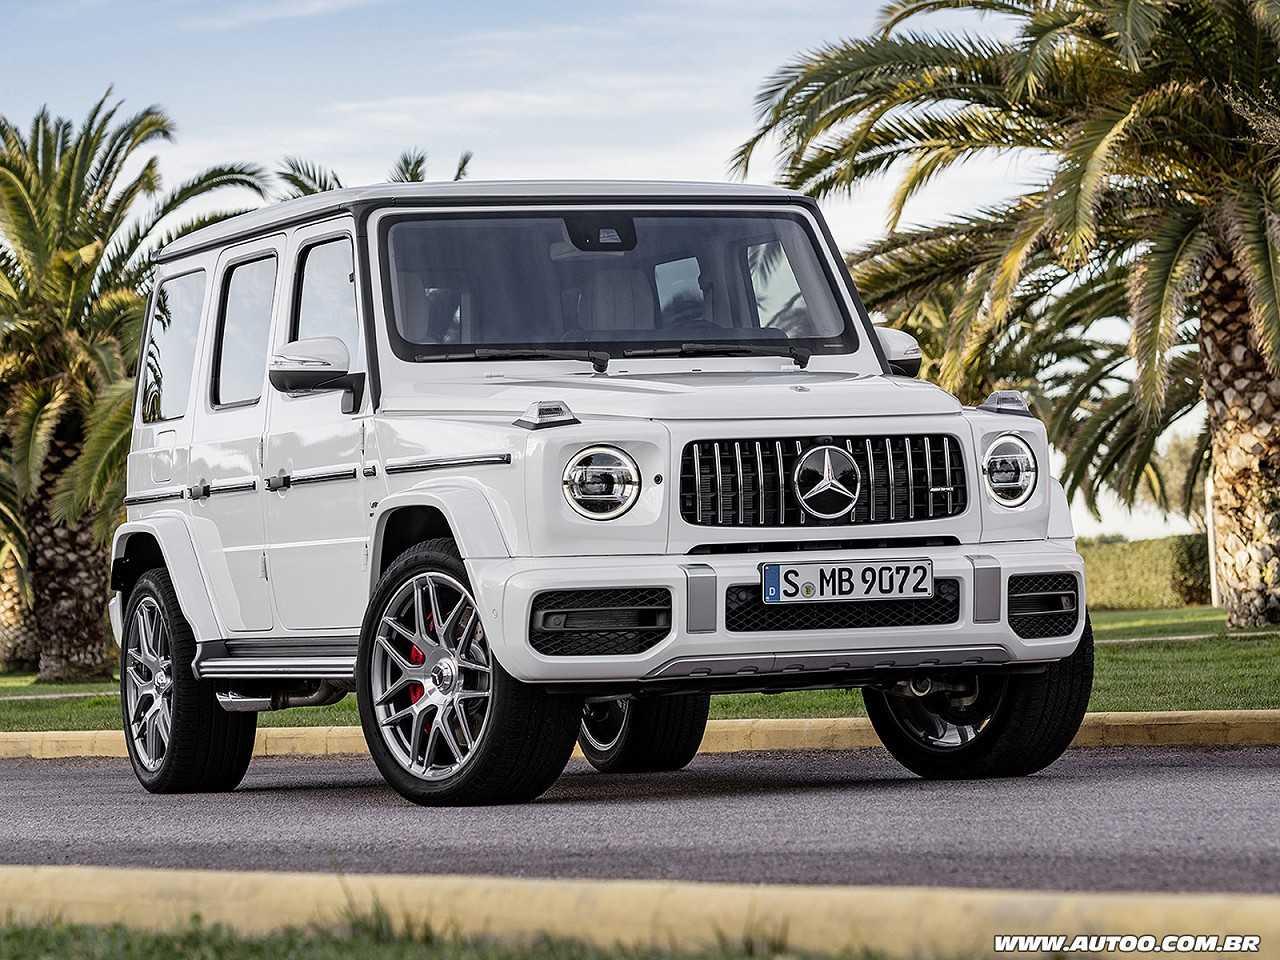 Mercedes-BenzClasse G 2019 - ângulo frontal